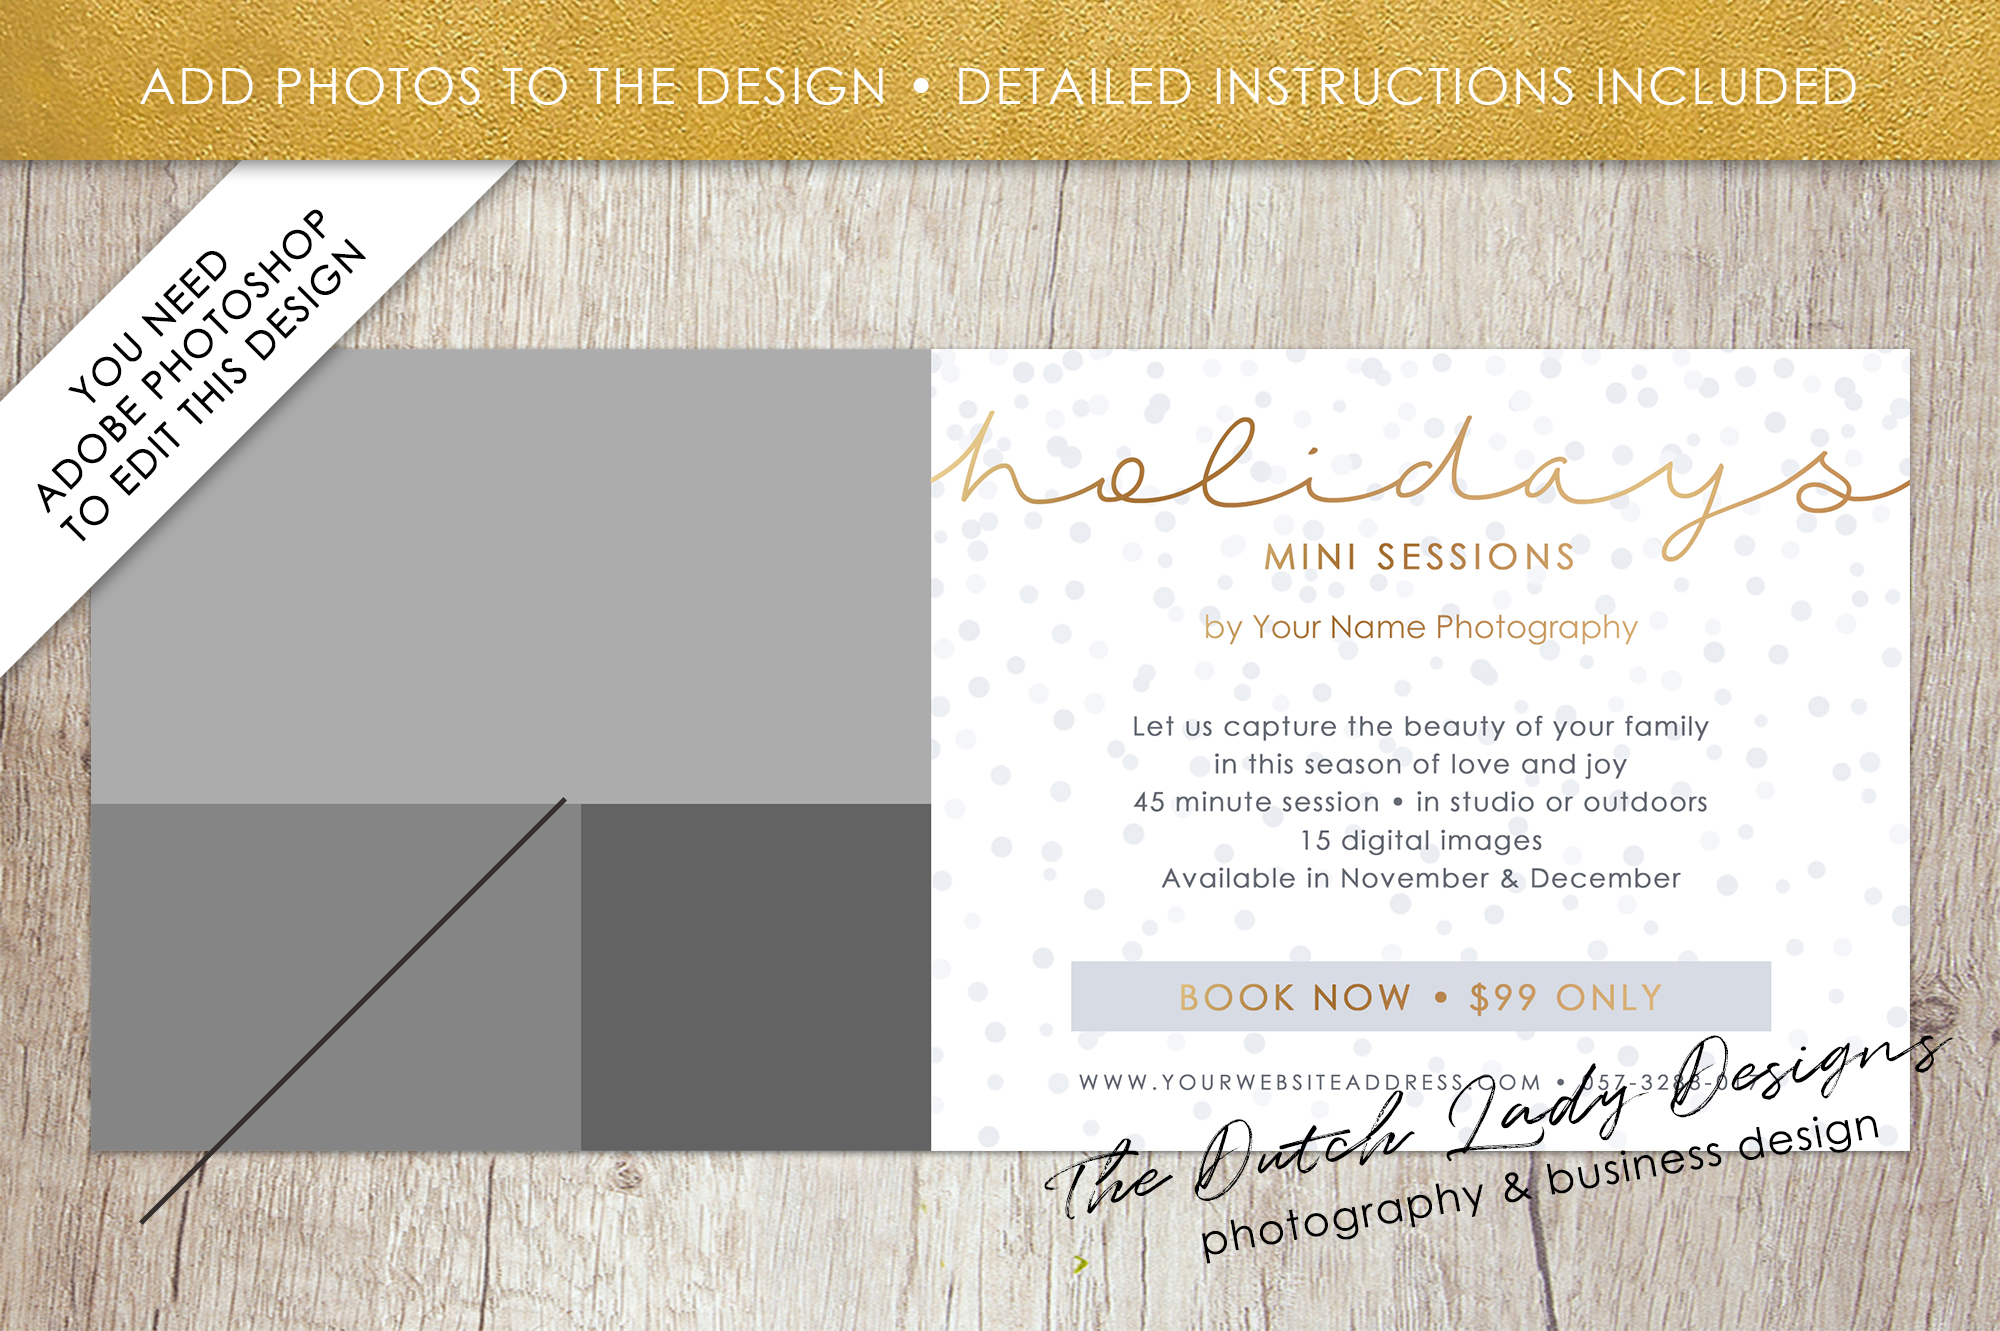 PSD Photo Mini Session Card Template - Design #24 example image 2